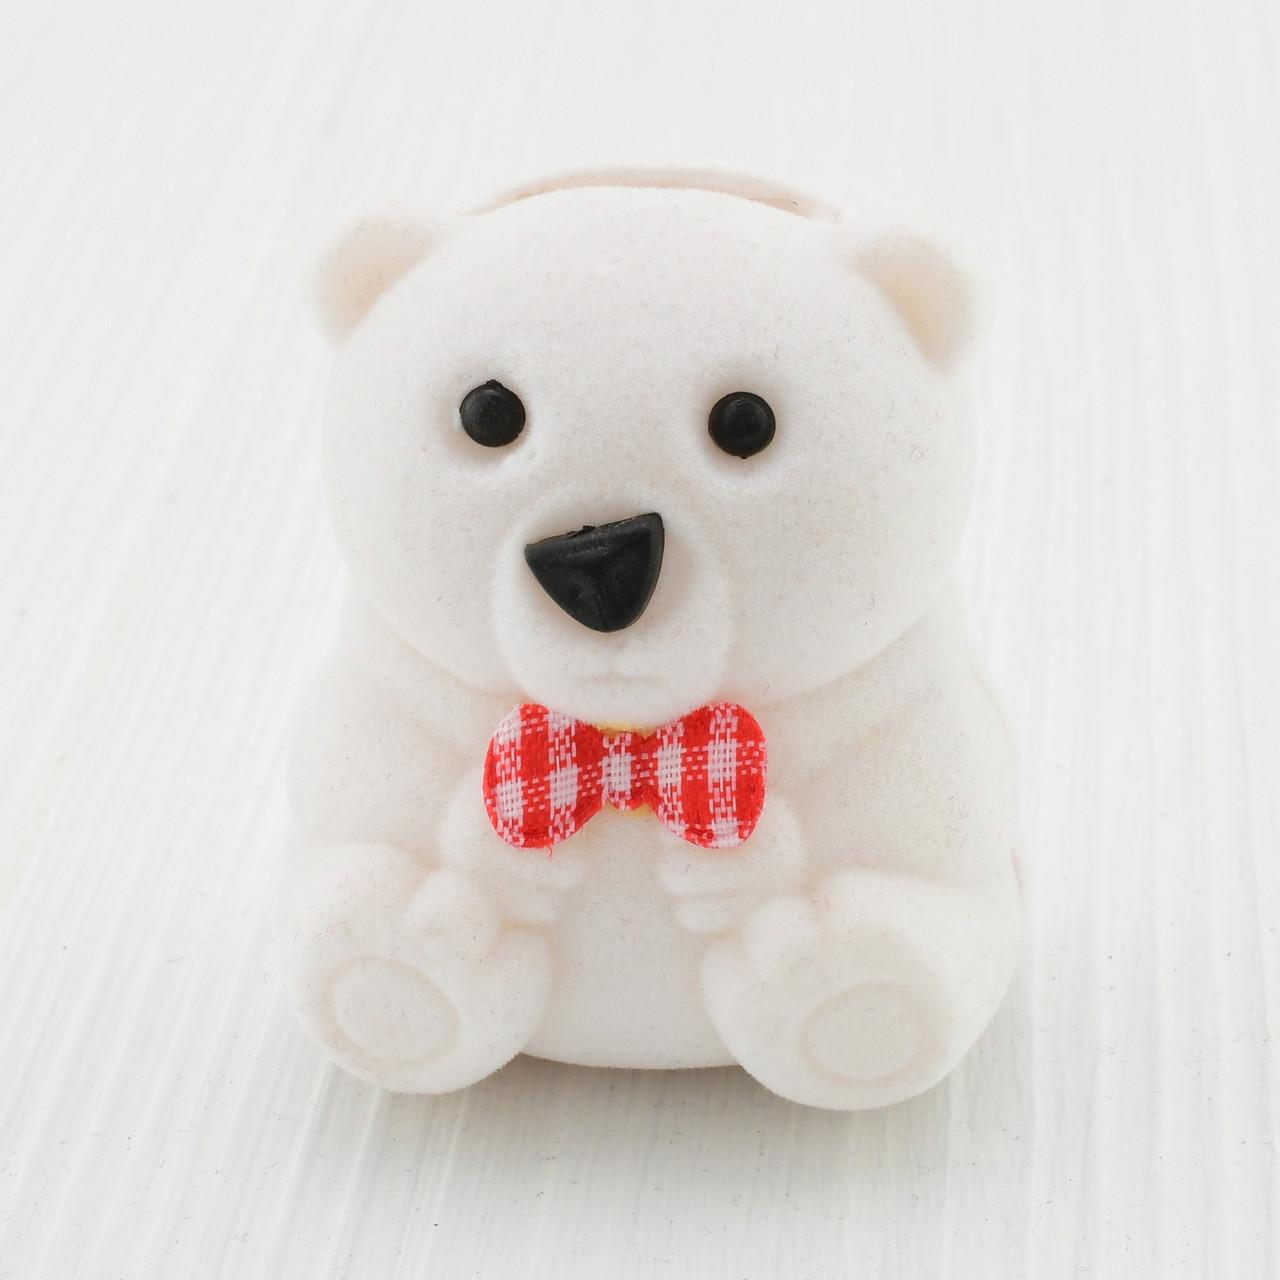 "Футляр ""Медведь"" для кольца-серег, 741053 белый бархат, размер  5*3 см"